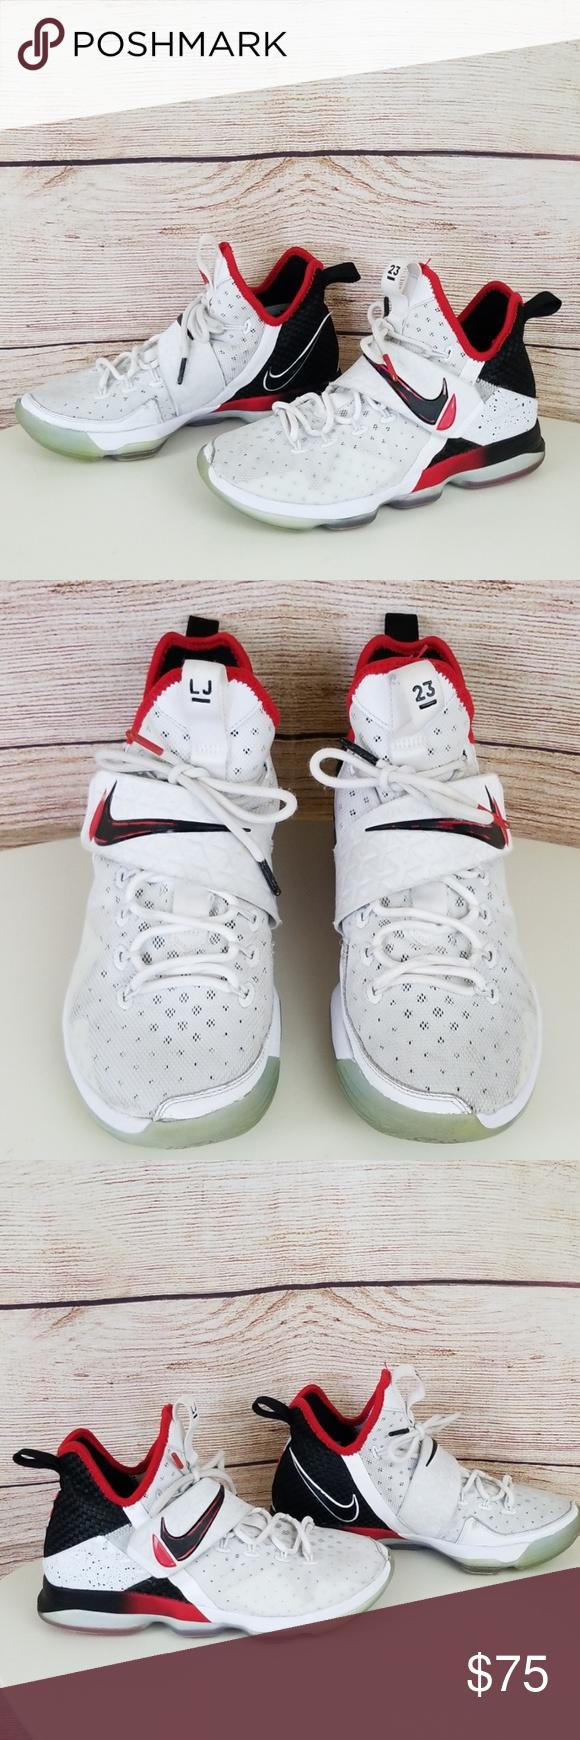 a5d4aed26b9 Nike Lebron 14